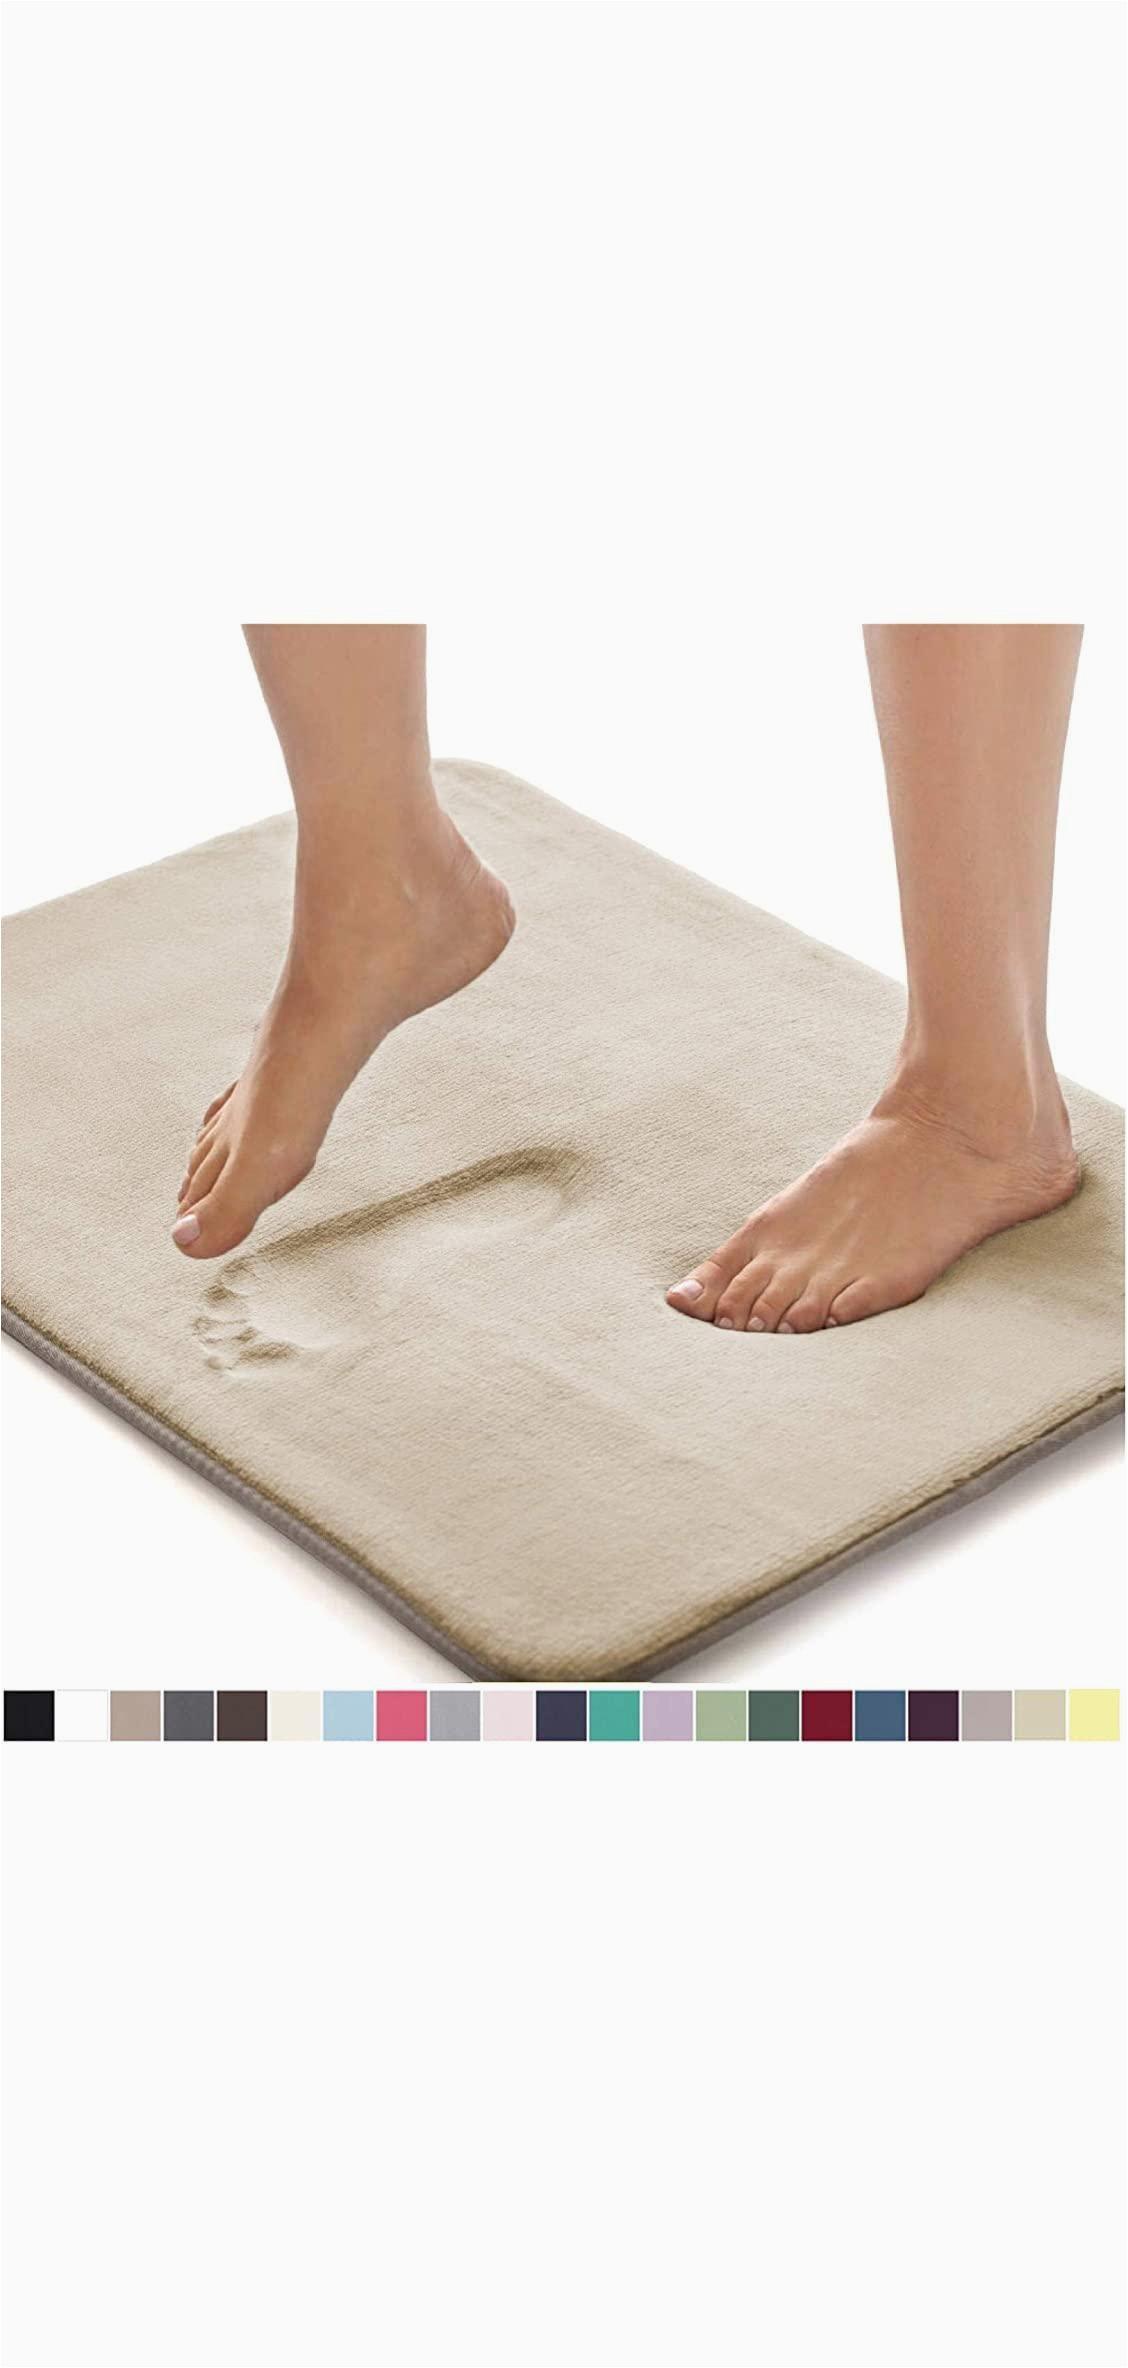 Gorilla Grip Bath Rug Bathroom Floor Gorilla Grip original Thick Memory Foam Bath